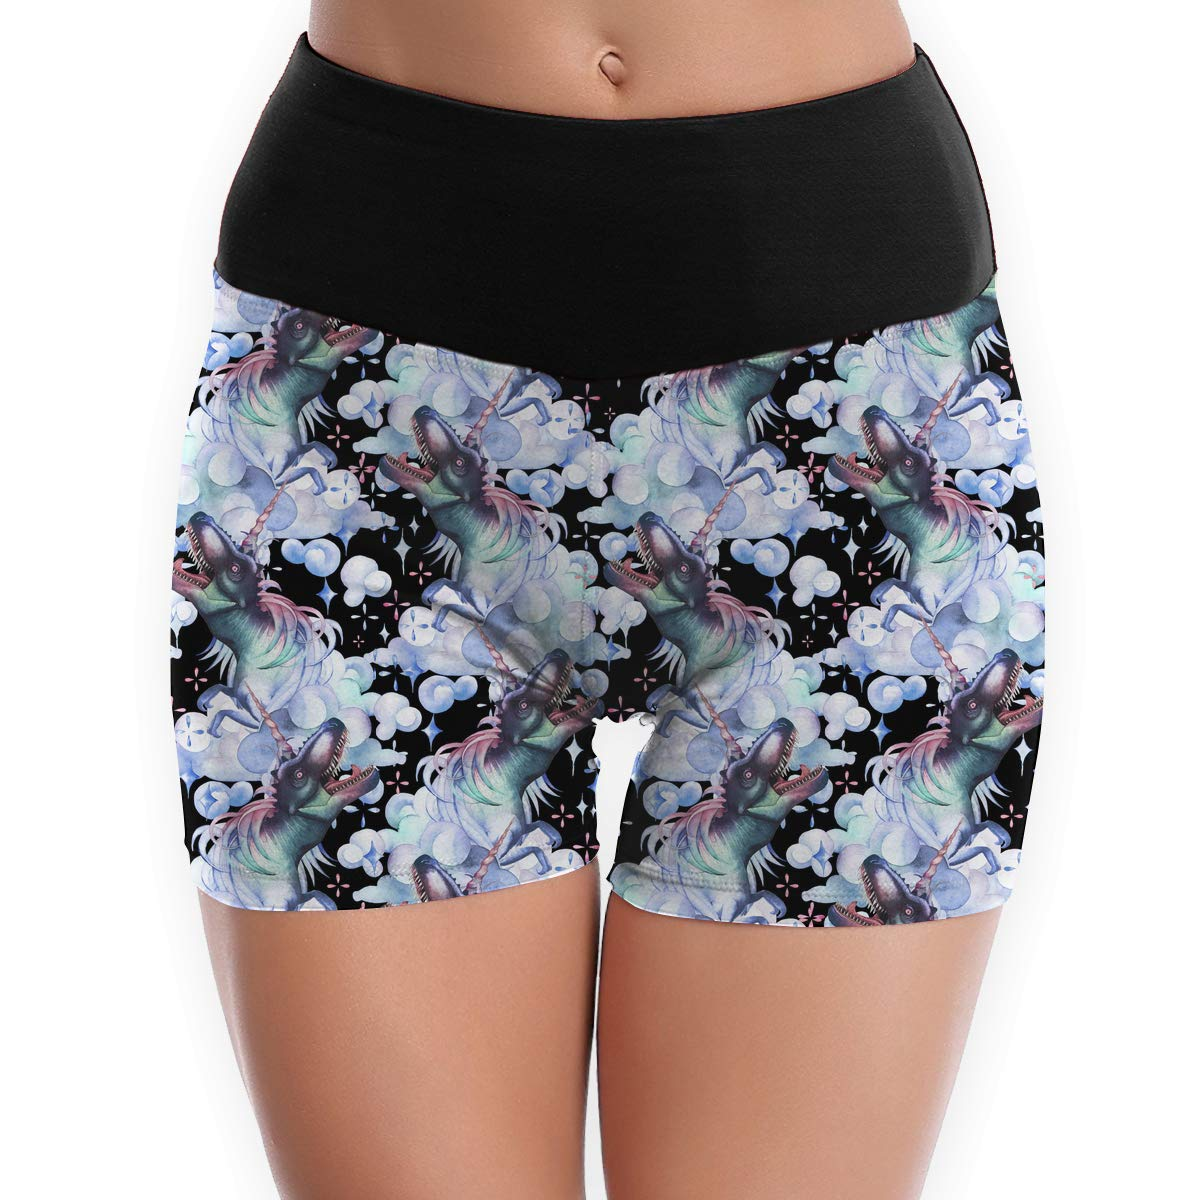 Tummy Control Hot Shorts S to XL Womens Watercolor Dinocorns Pattern Power Flex Yoga Shorts